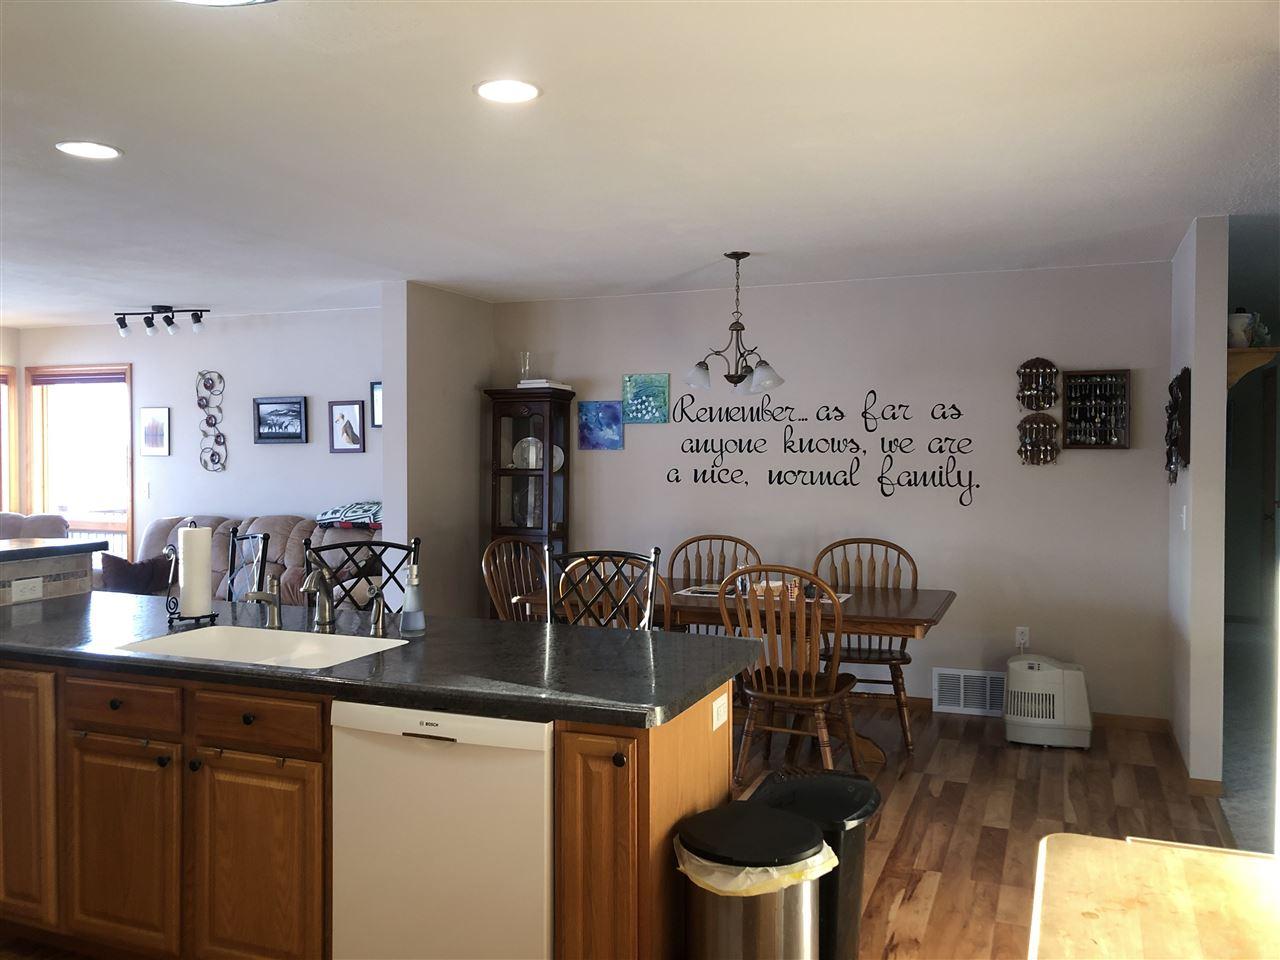 243 Golf Ridge, Elkader, Iowa 52043, 4 Bedrooms Bedrooms, ,3 BathroomsBathrooms,Single Family,For Sale,243 Golf Ridge,20210725